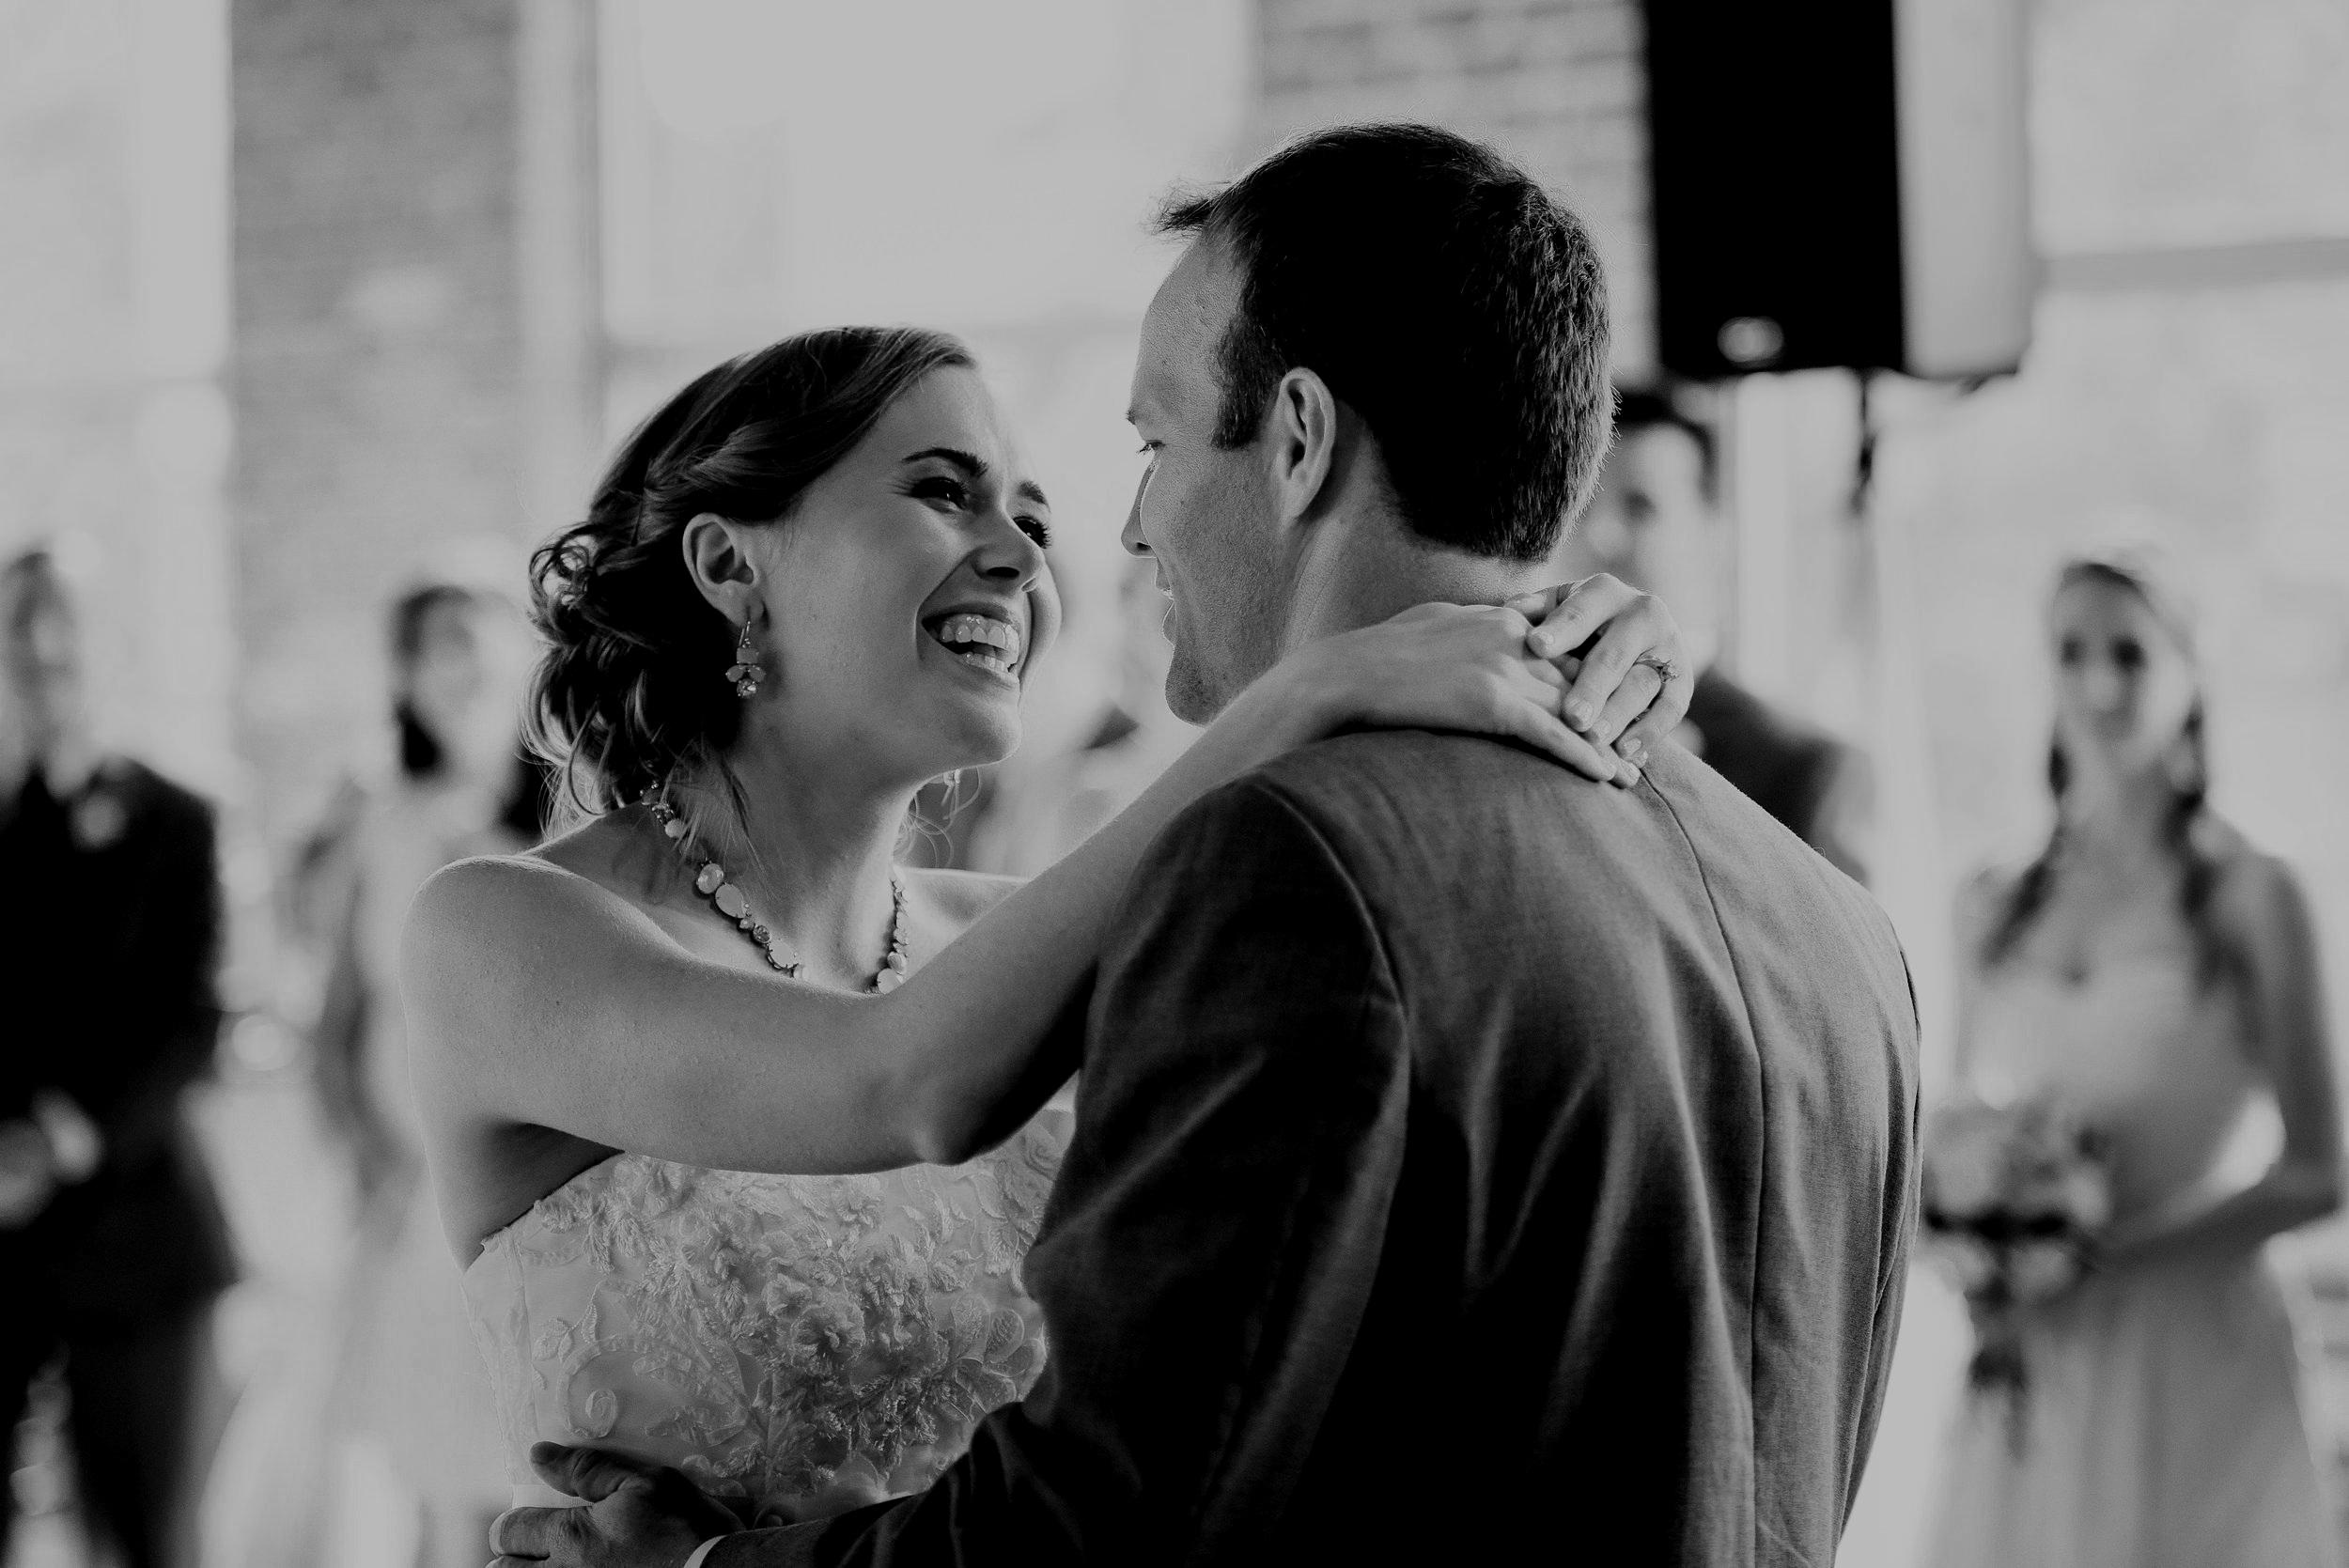 WEDDING DJS - MODERN, UNFORGETTABLE WEDDINGS.